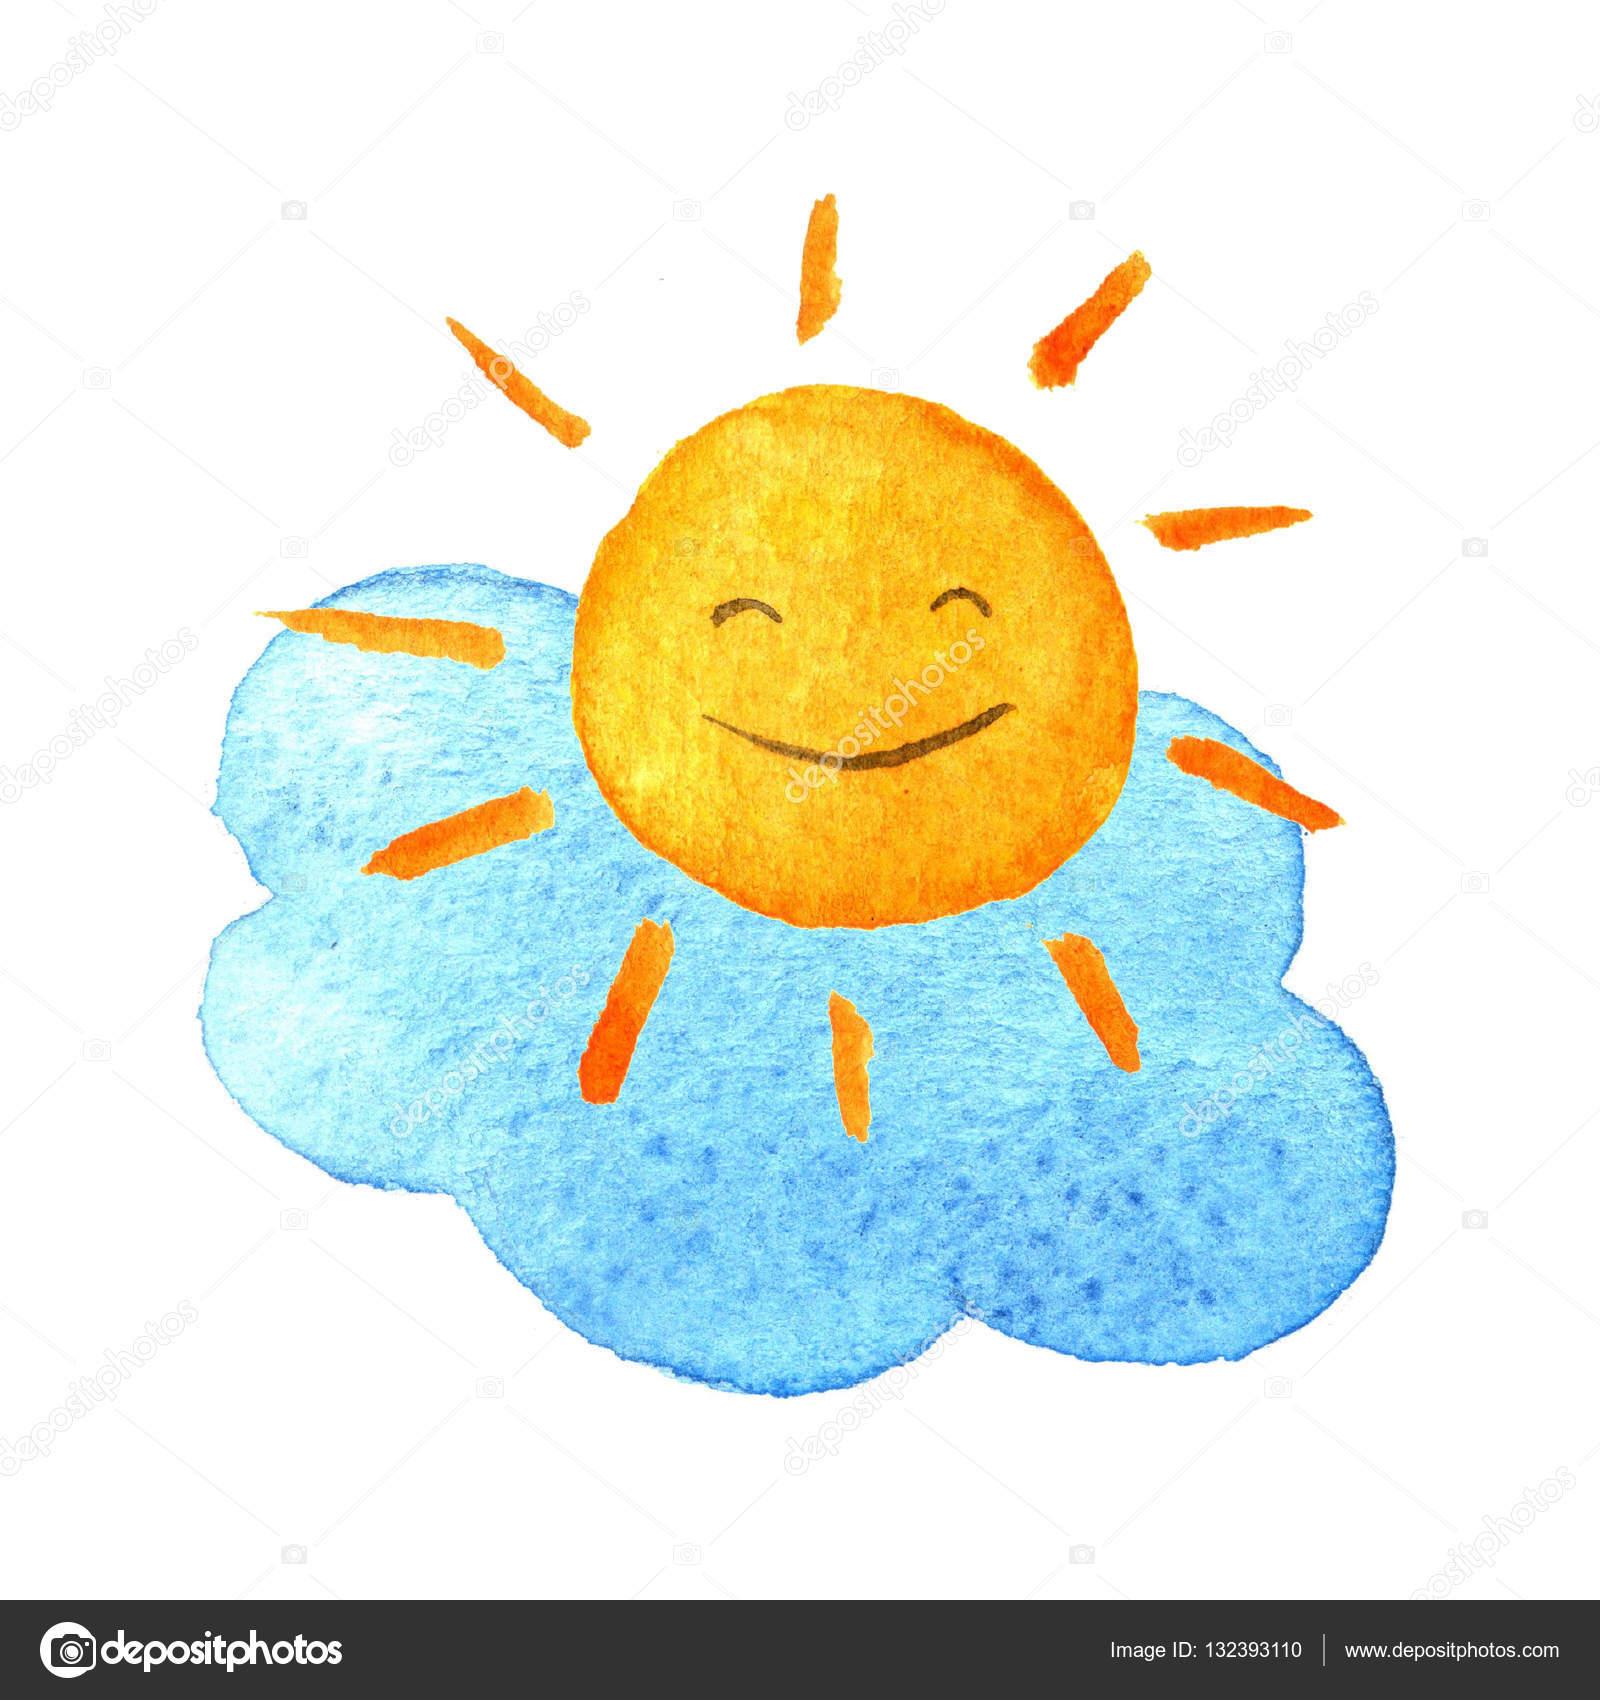 1600x1700 Cute Cartoon Cloud And Sunshine. Hand Drawn Watercolor